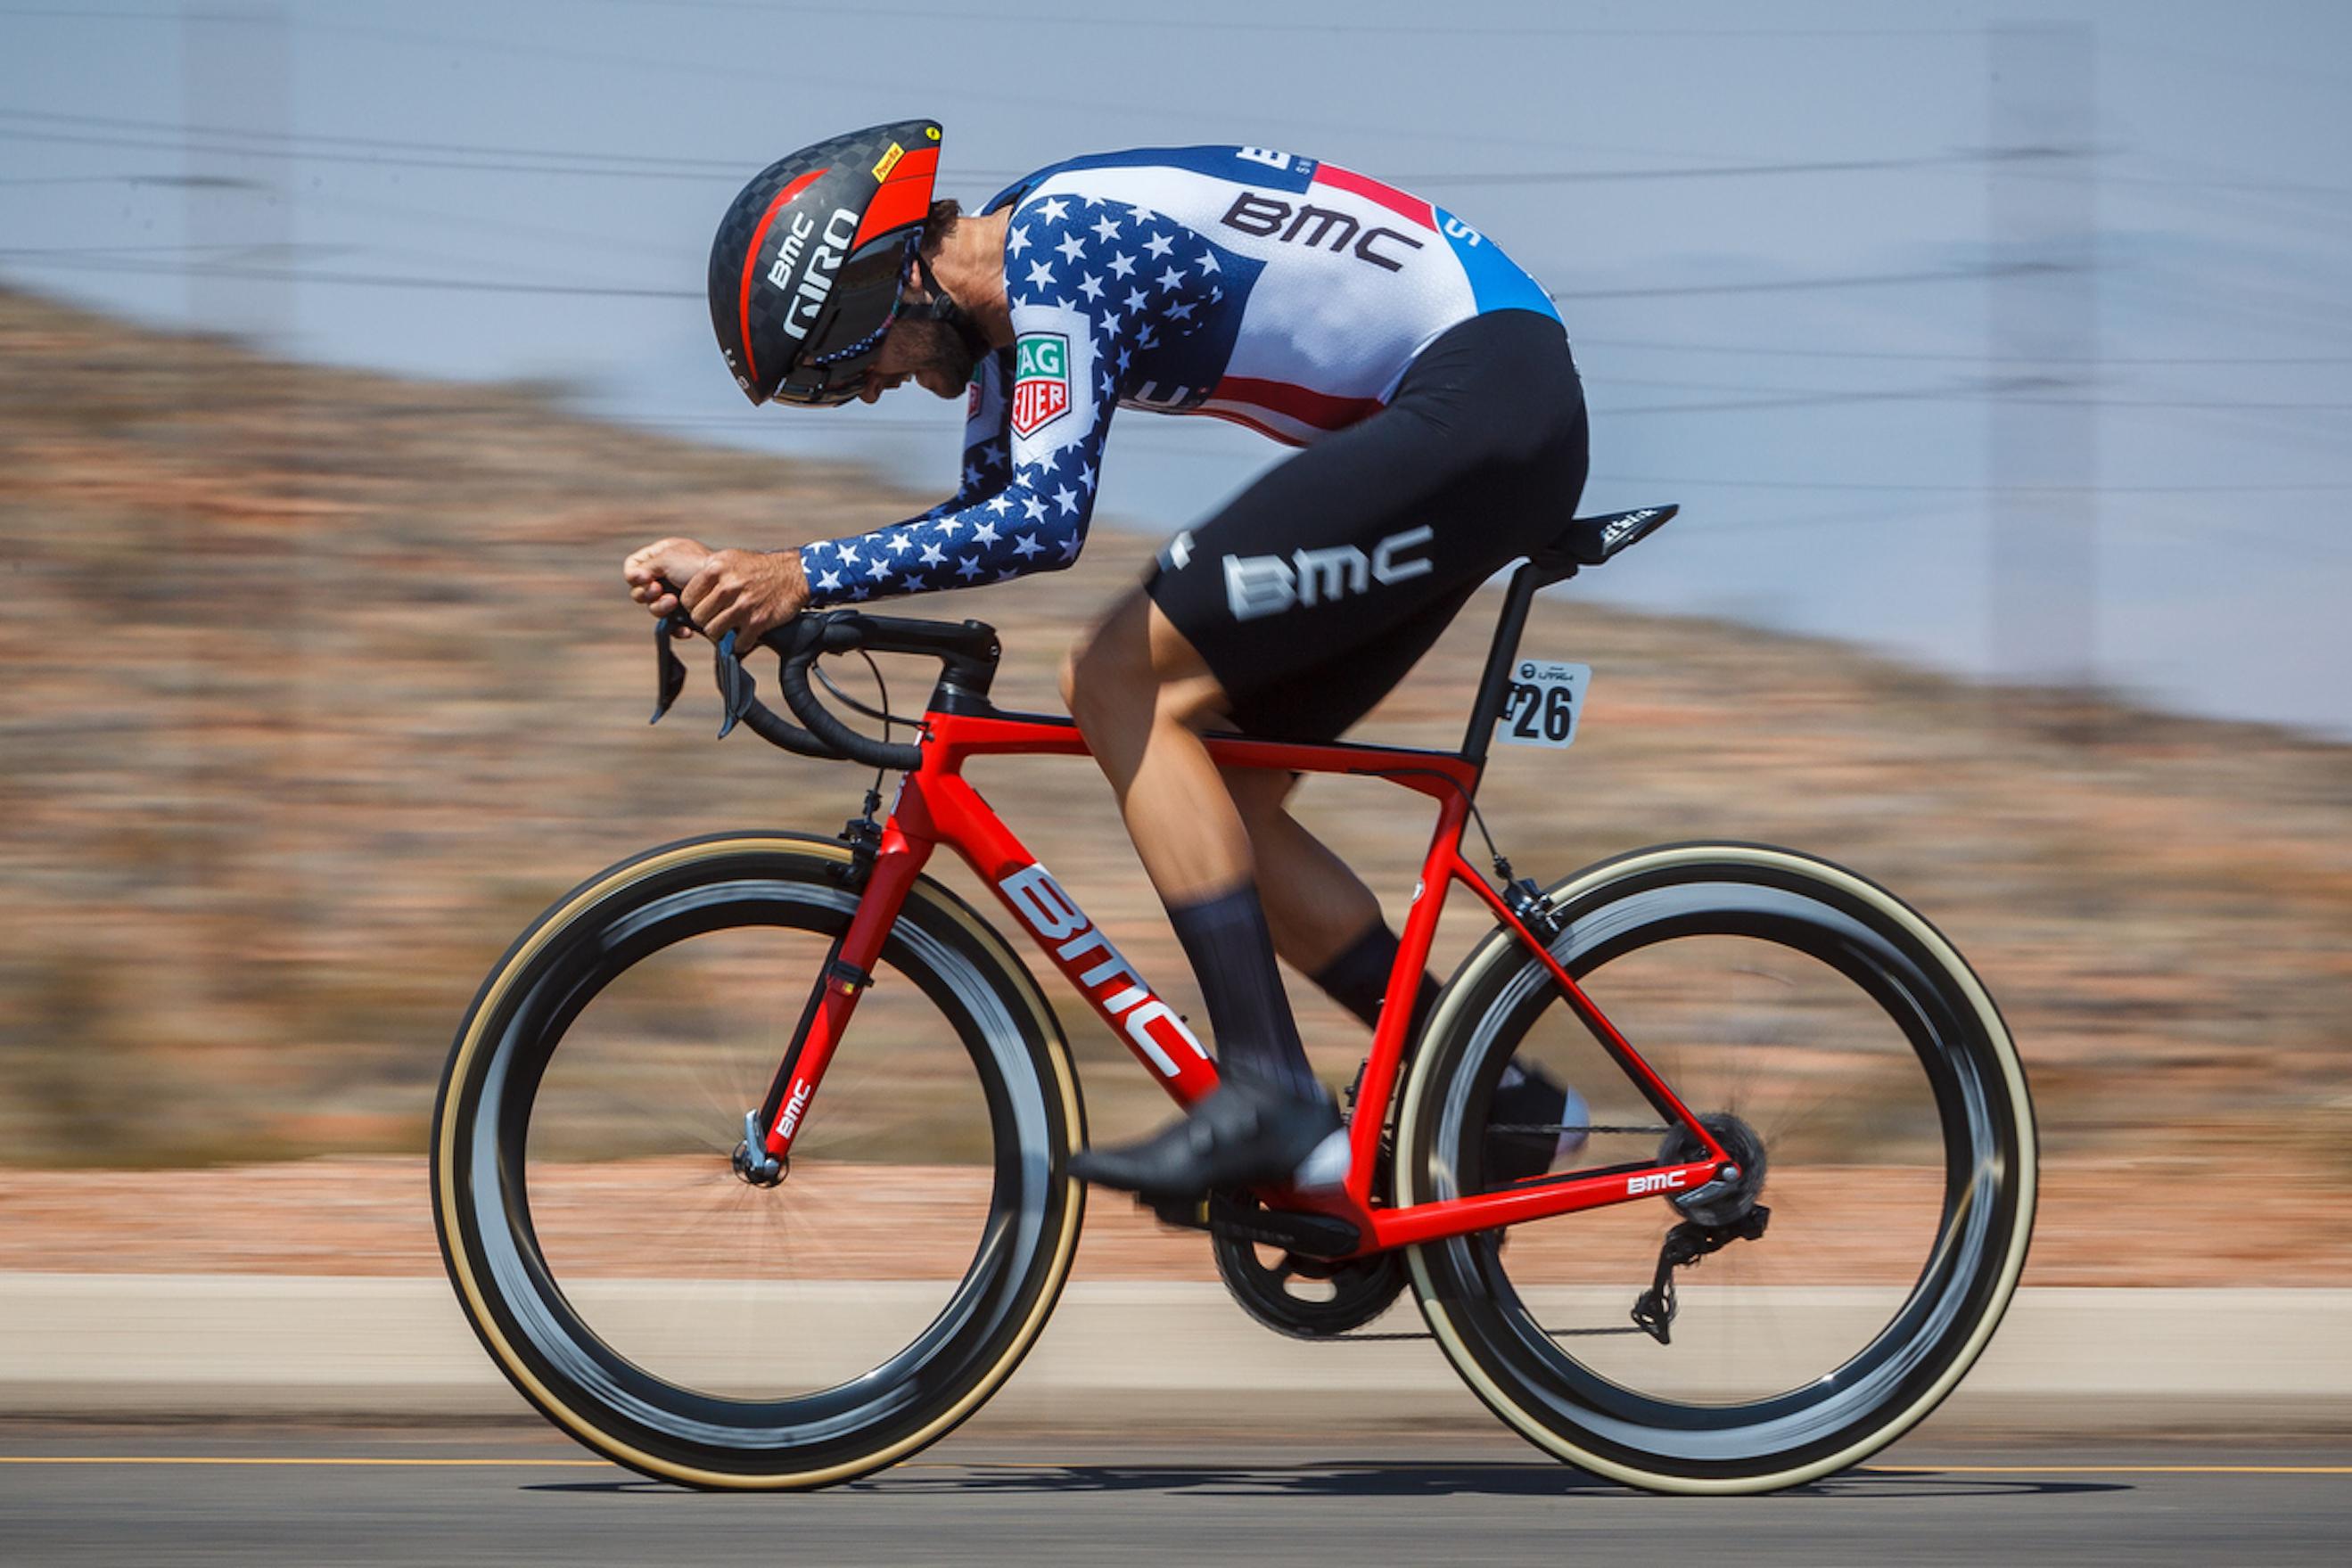 Rosskopf extends with BMC/CCC team - Transfer Shorts